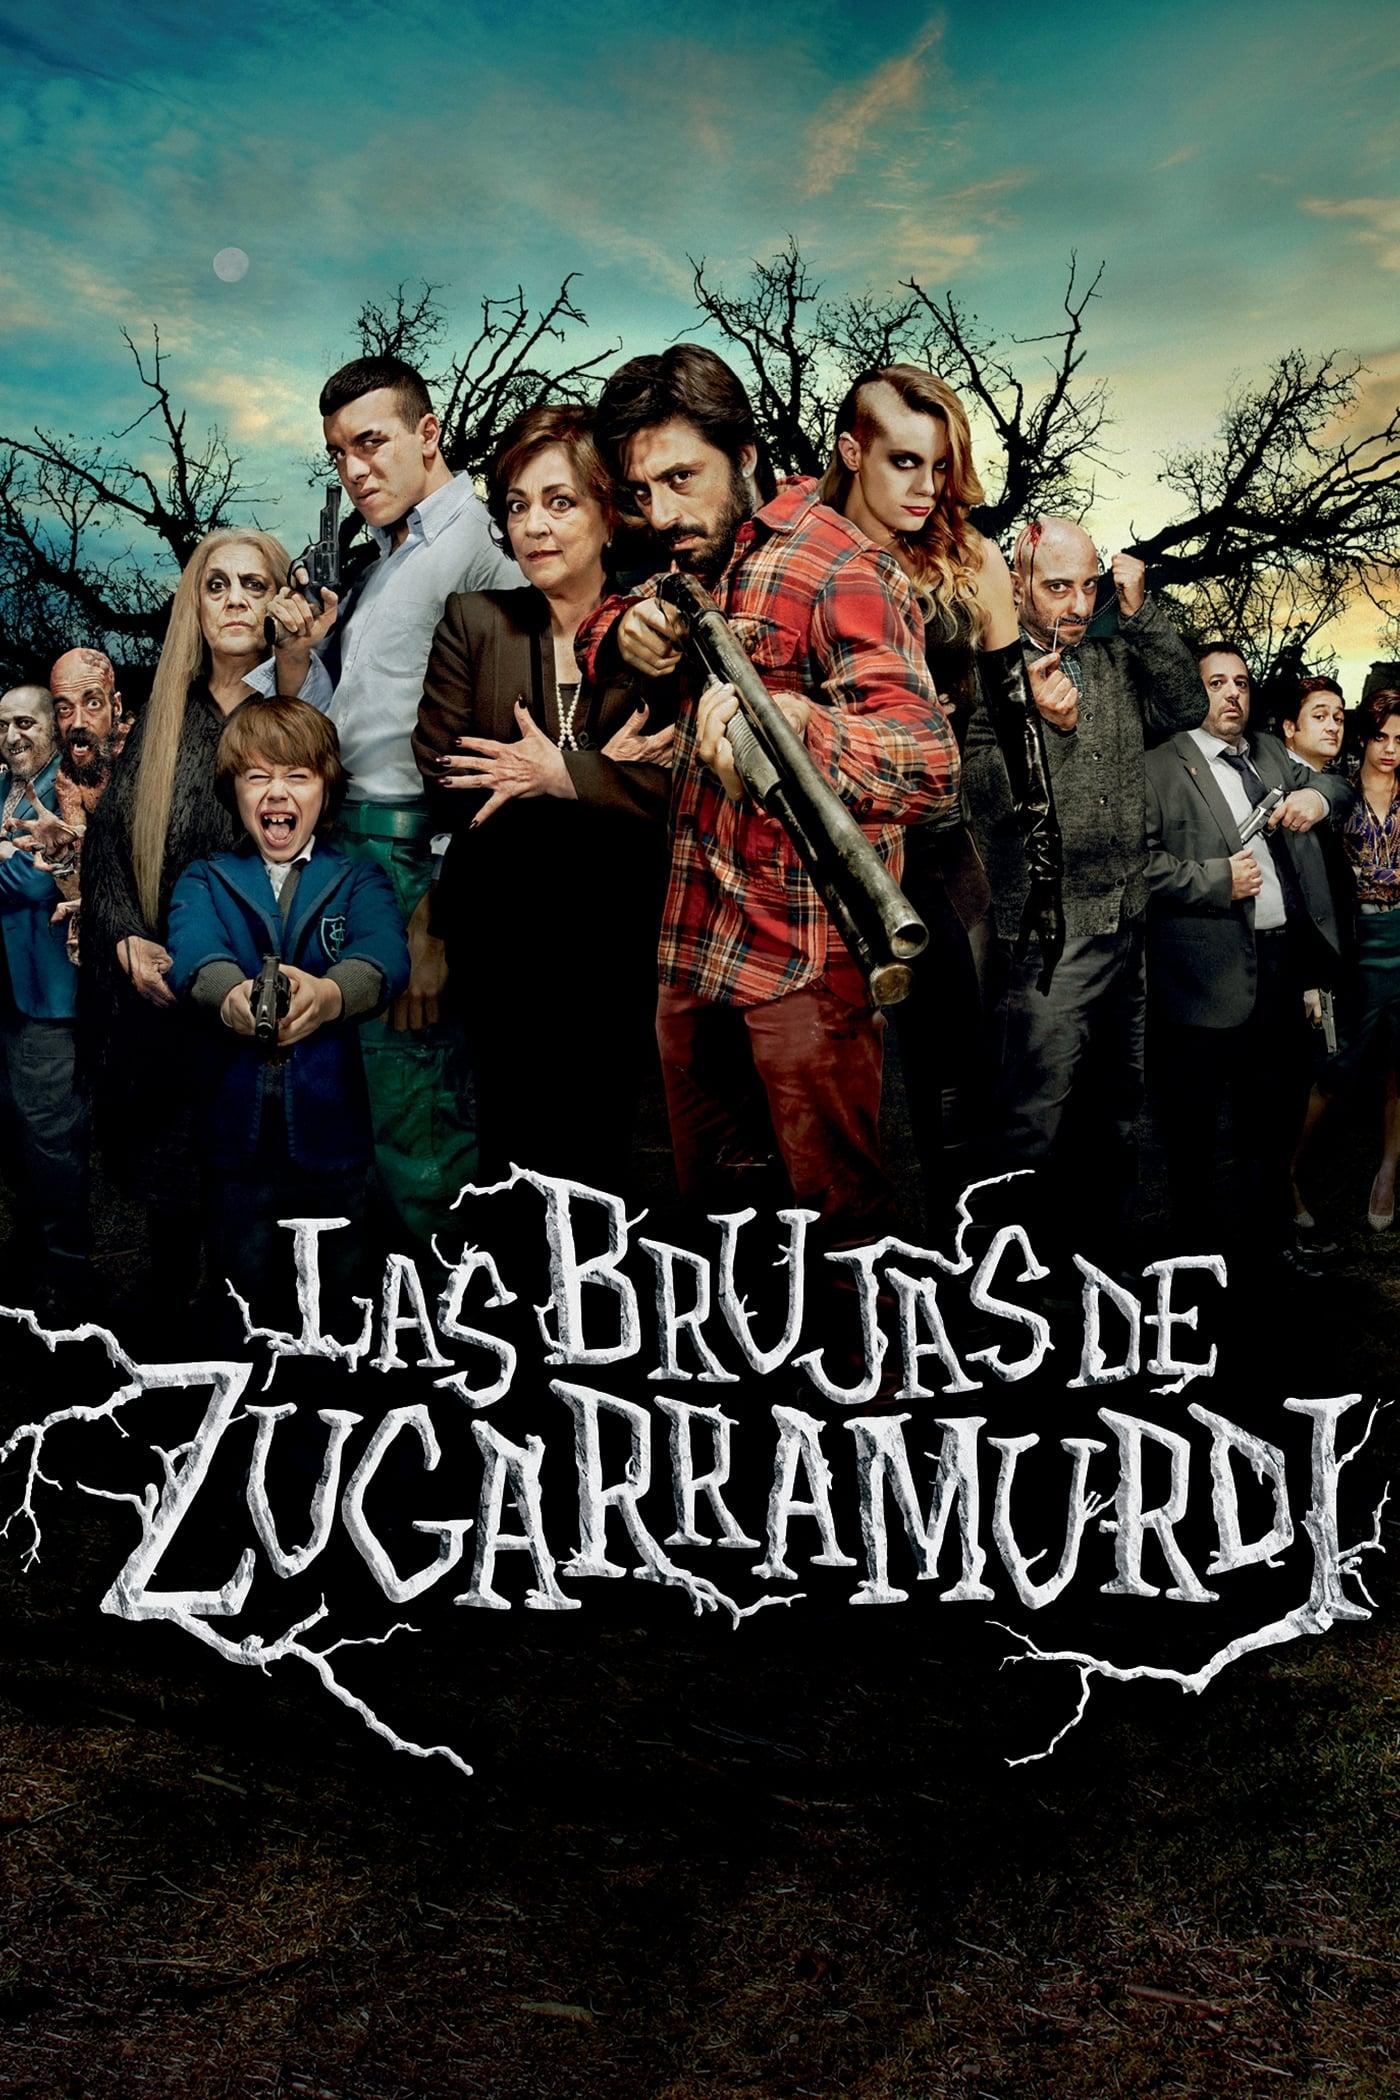 As Bruxas de Zugarramurdi Legendado